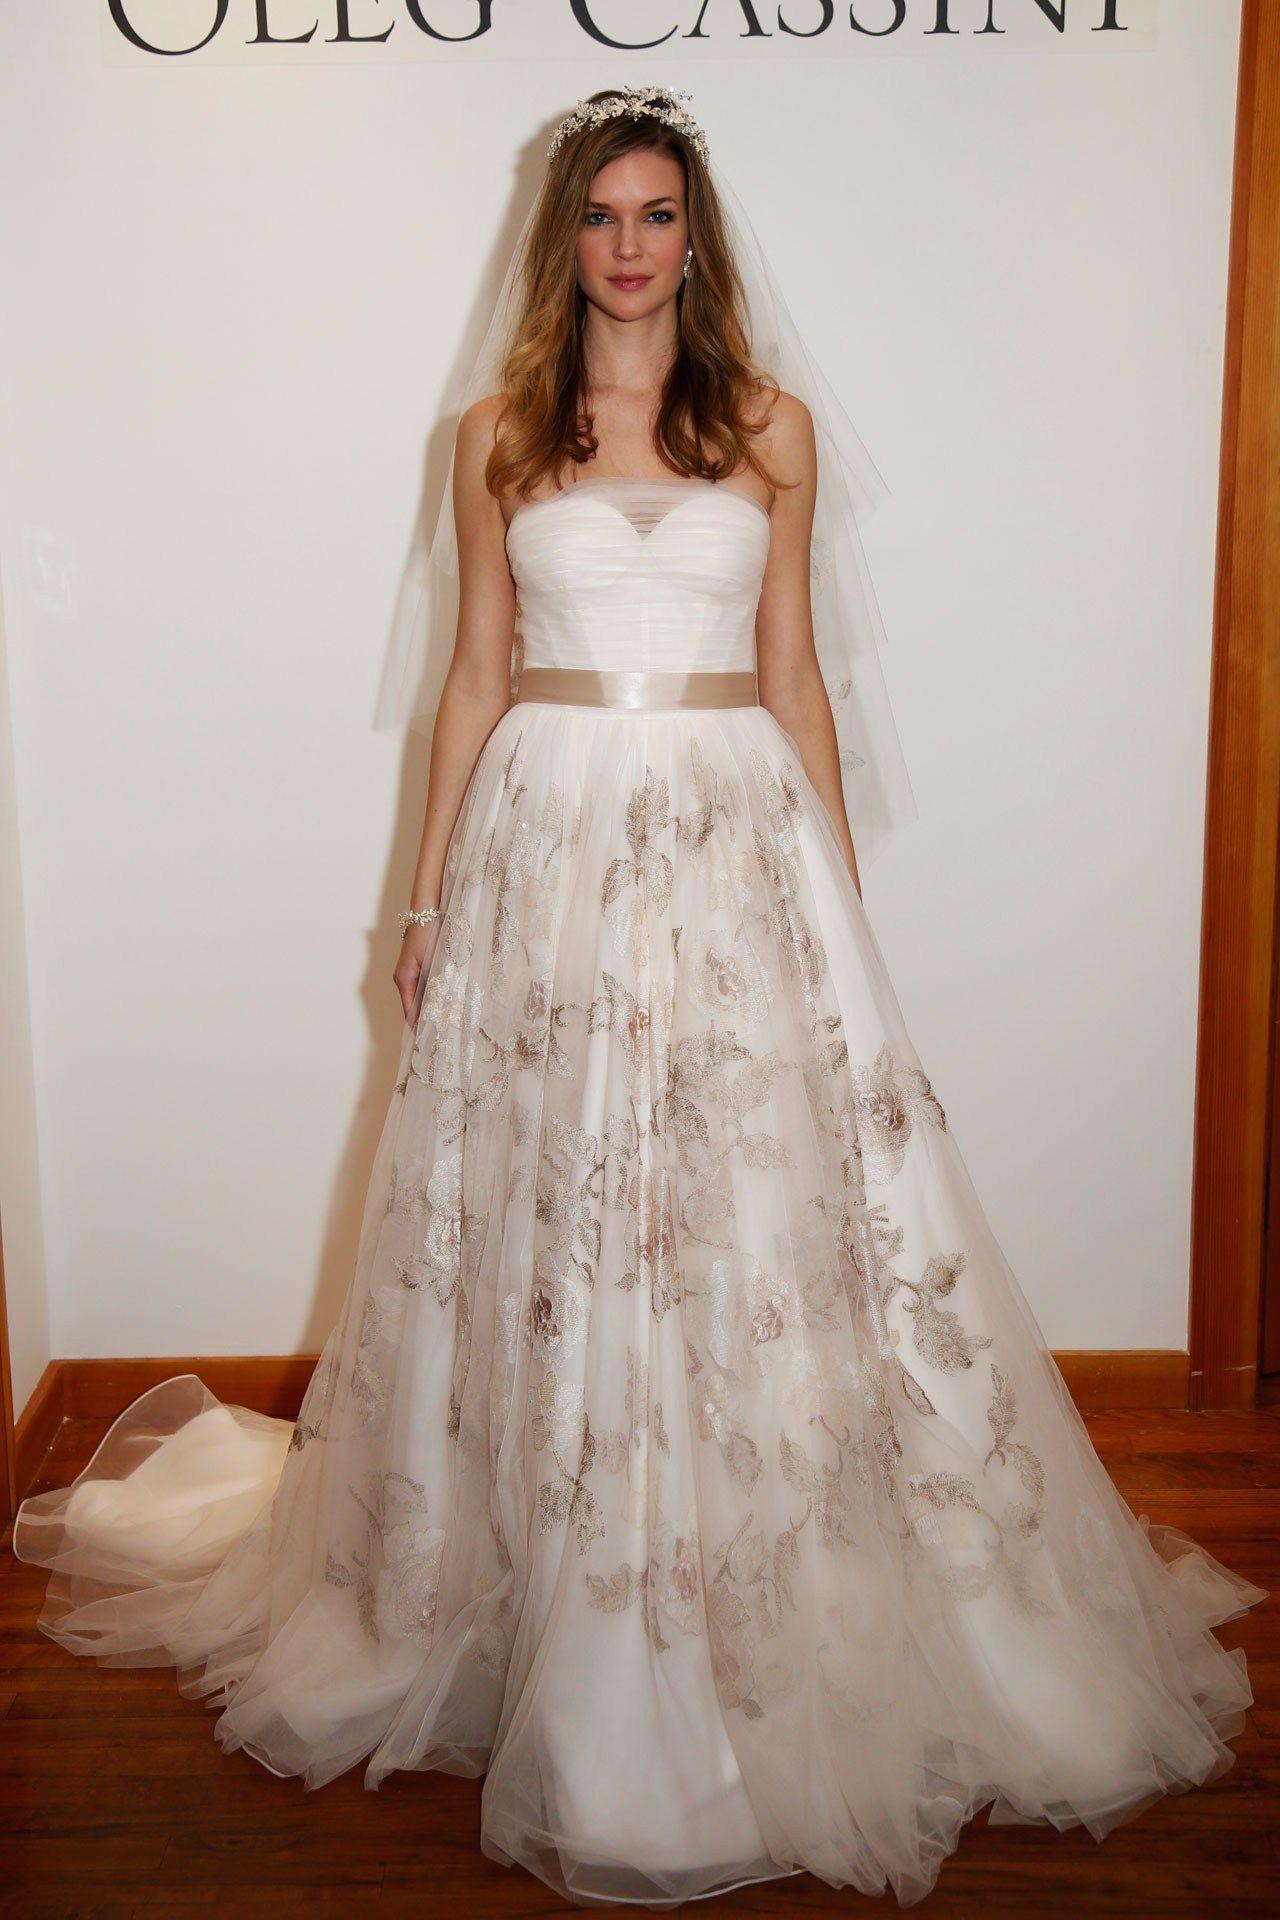 Vera wang designer wedding dresses  Wedding Dresses  The Ultimate Gallery BridesMagazine  Uk